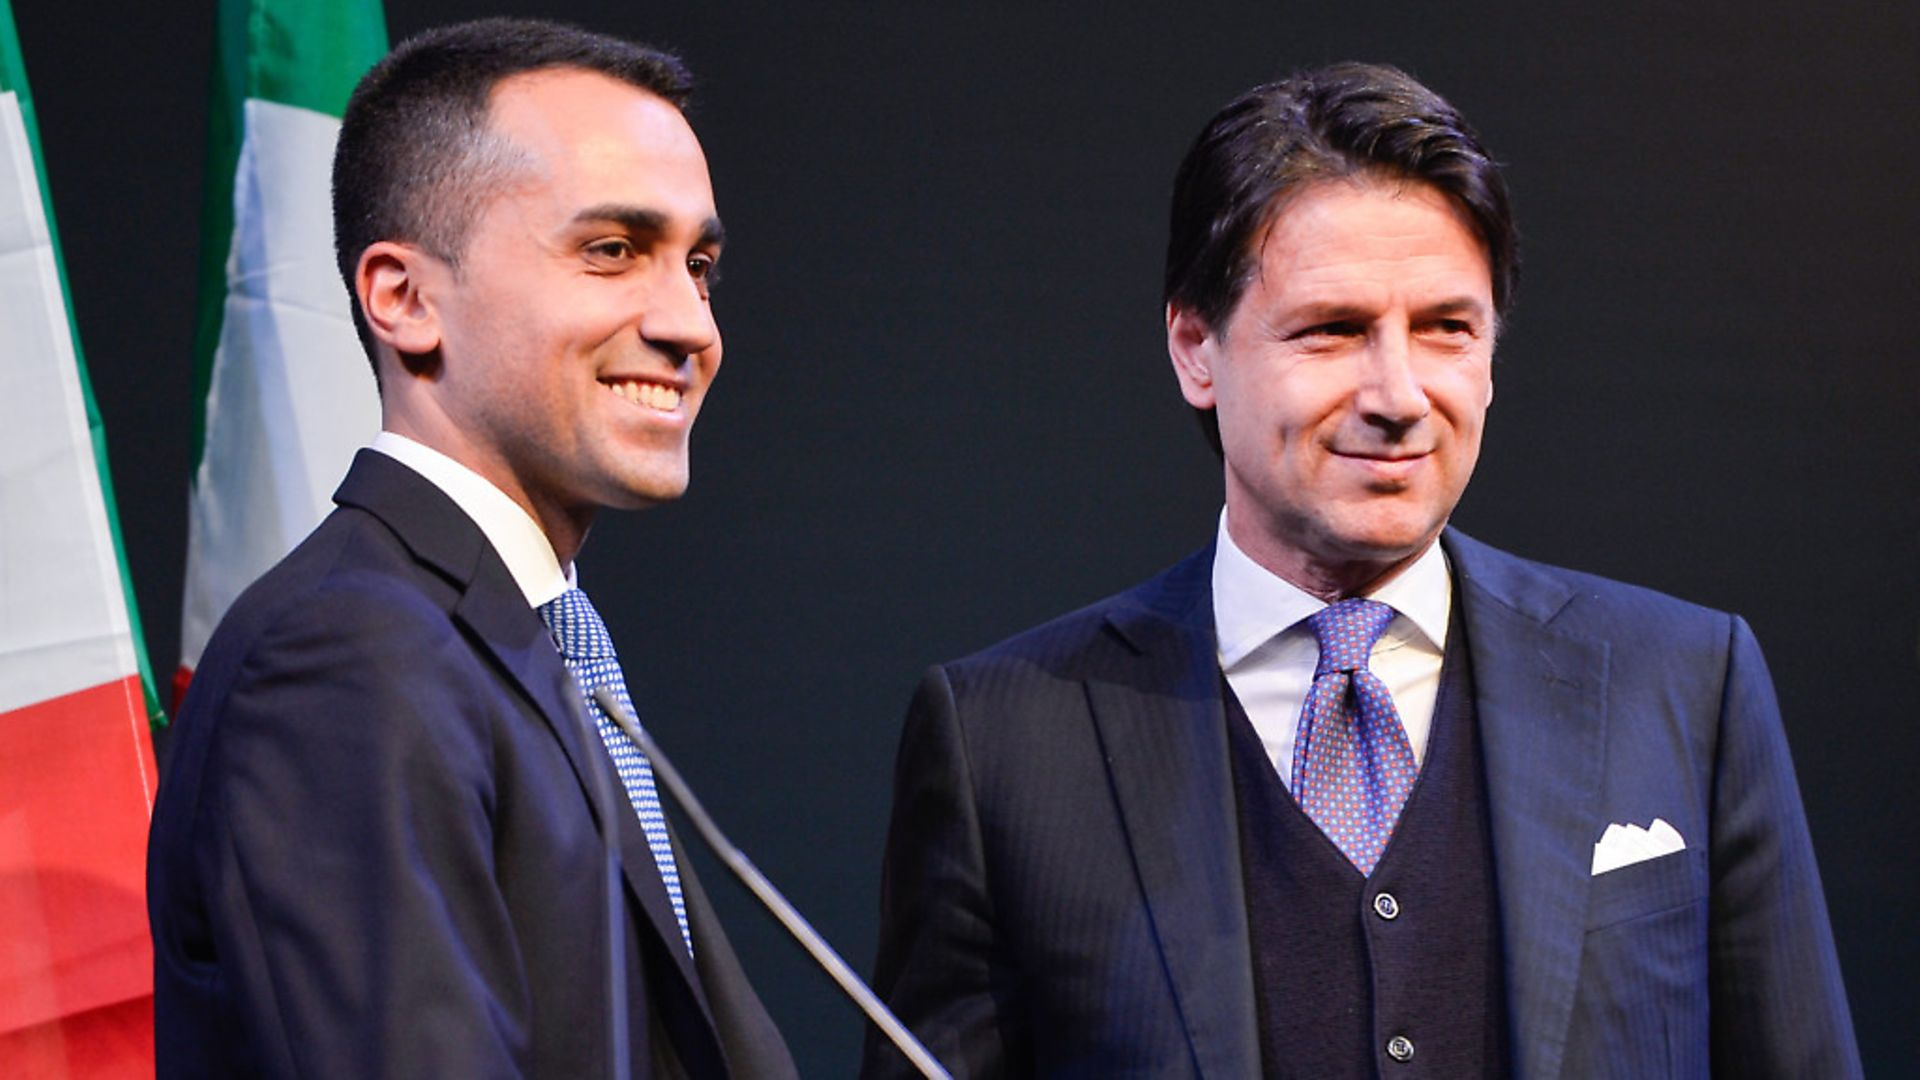 Italian Premier Giuseppe Conte and Labour Minister Luigi Di Maio in Rome, Italy. (Photo by Silvia Lore/NurPhoto/Sipa USA) - Credit: SIPA USA/PA Images